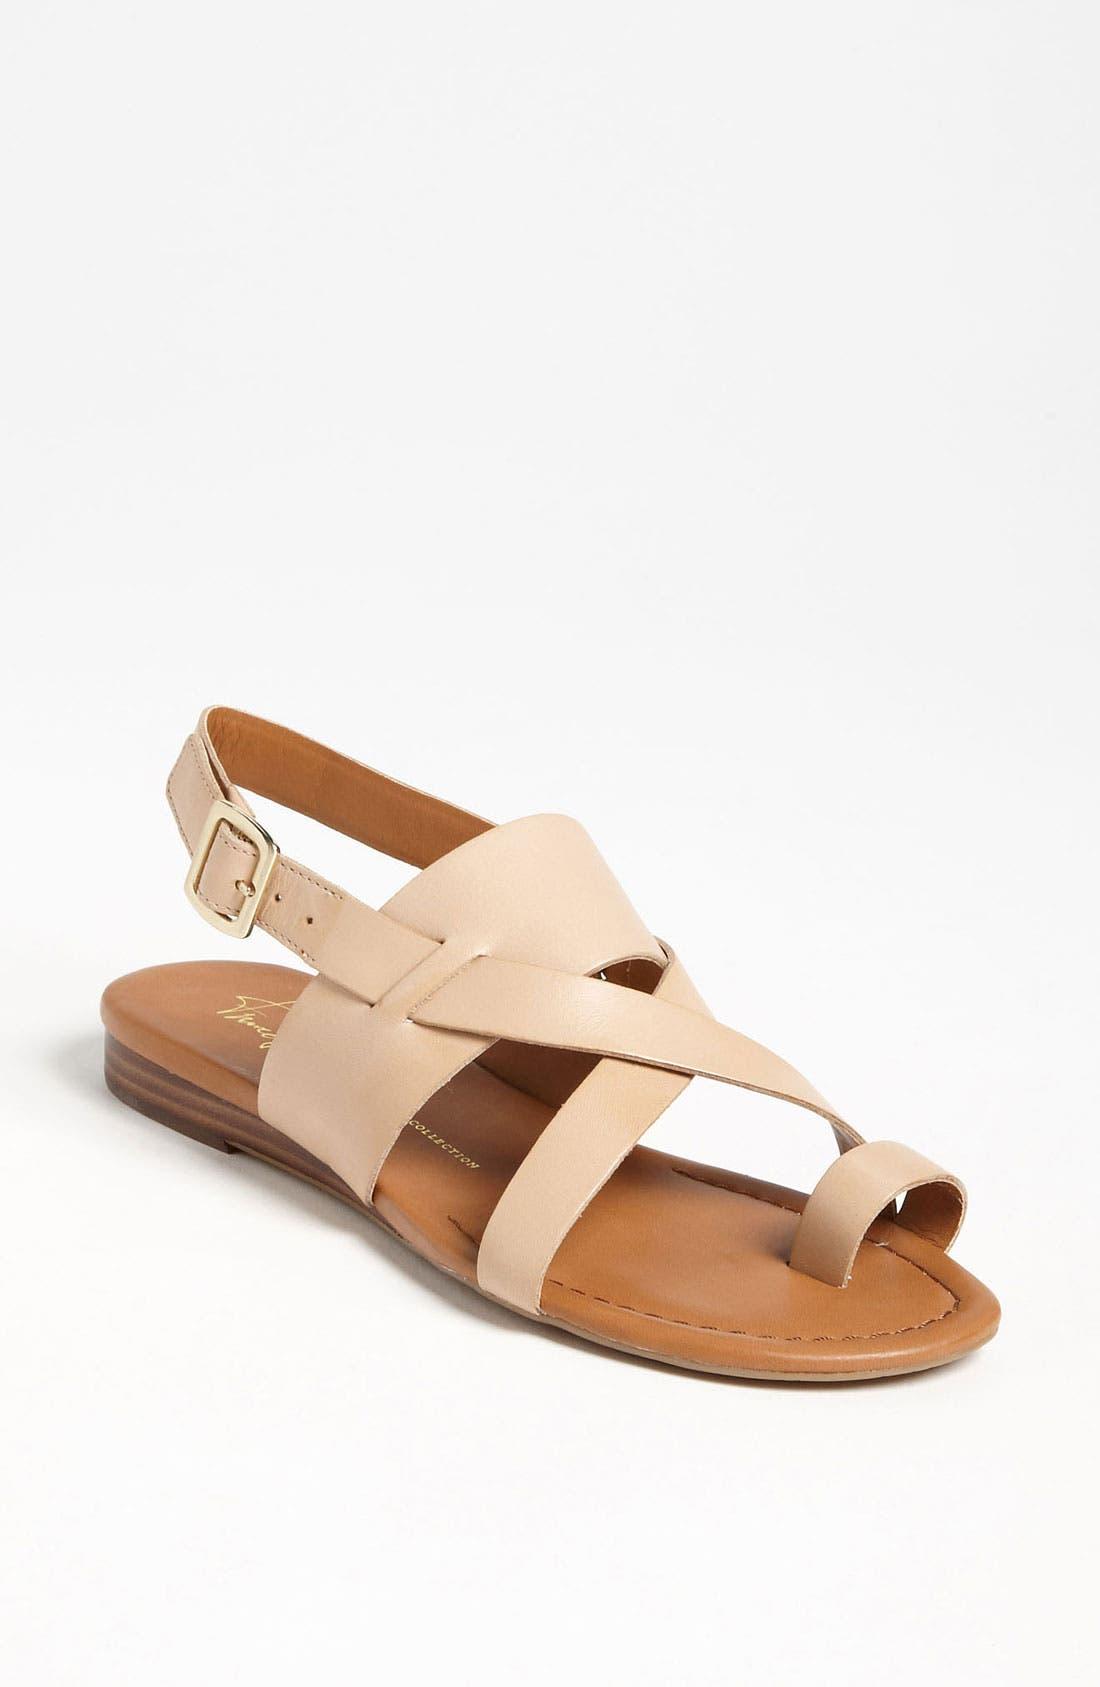 Alternate Image 1 Selected - Franco Sarto 'Gia' Sandal